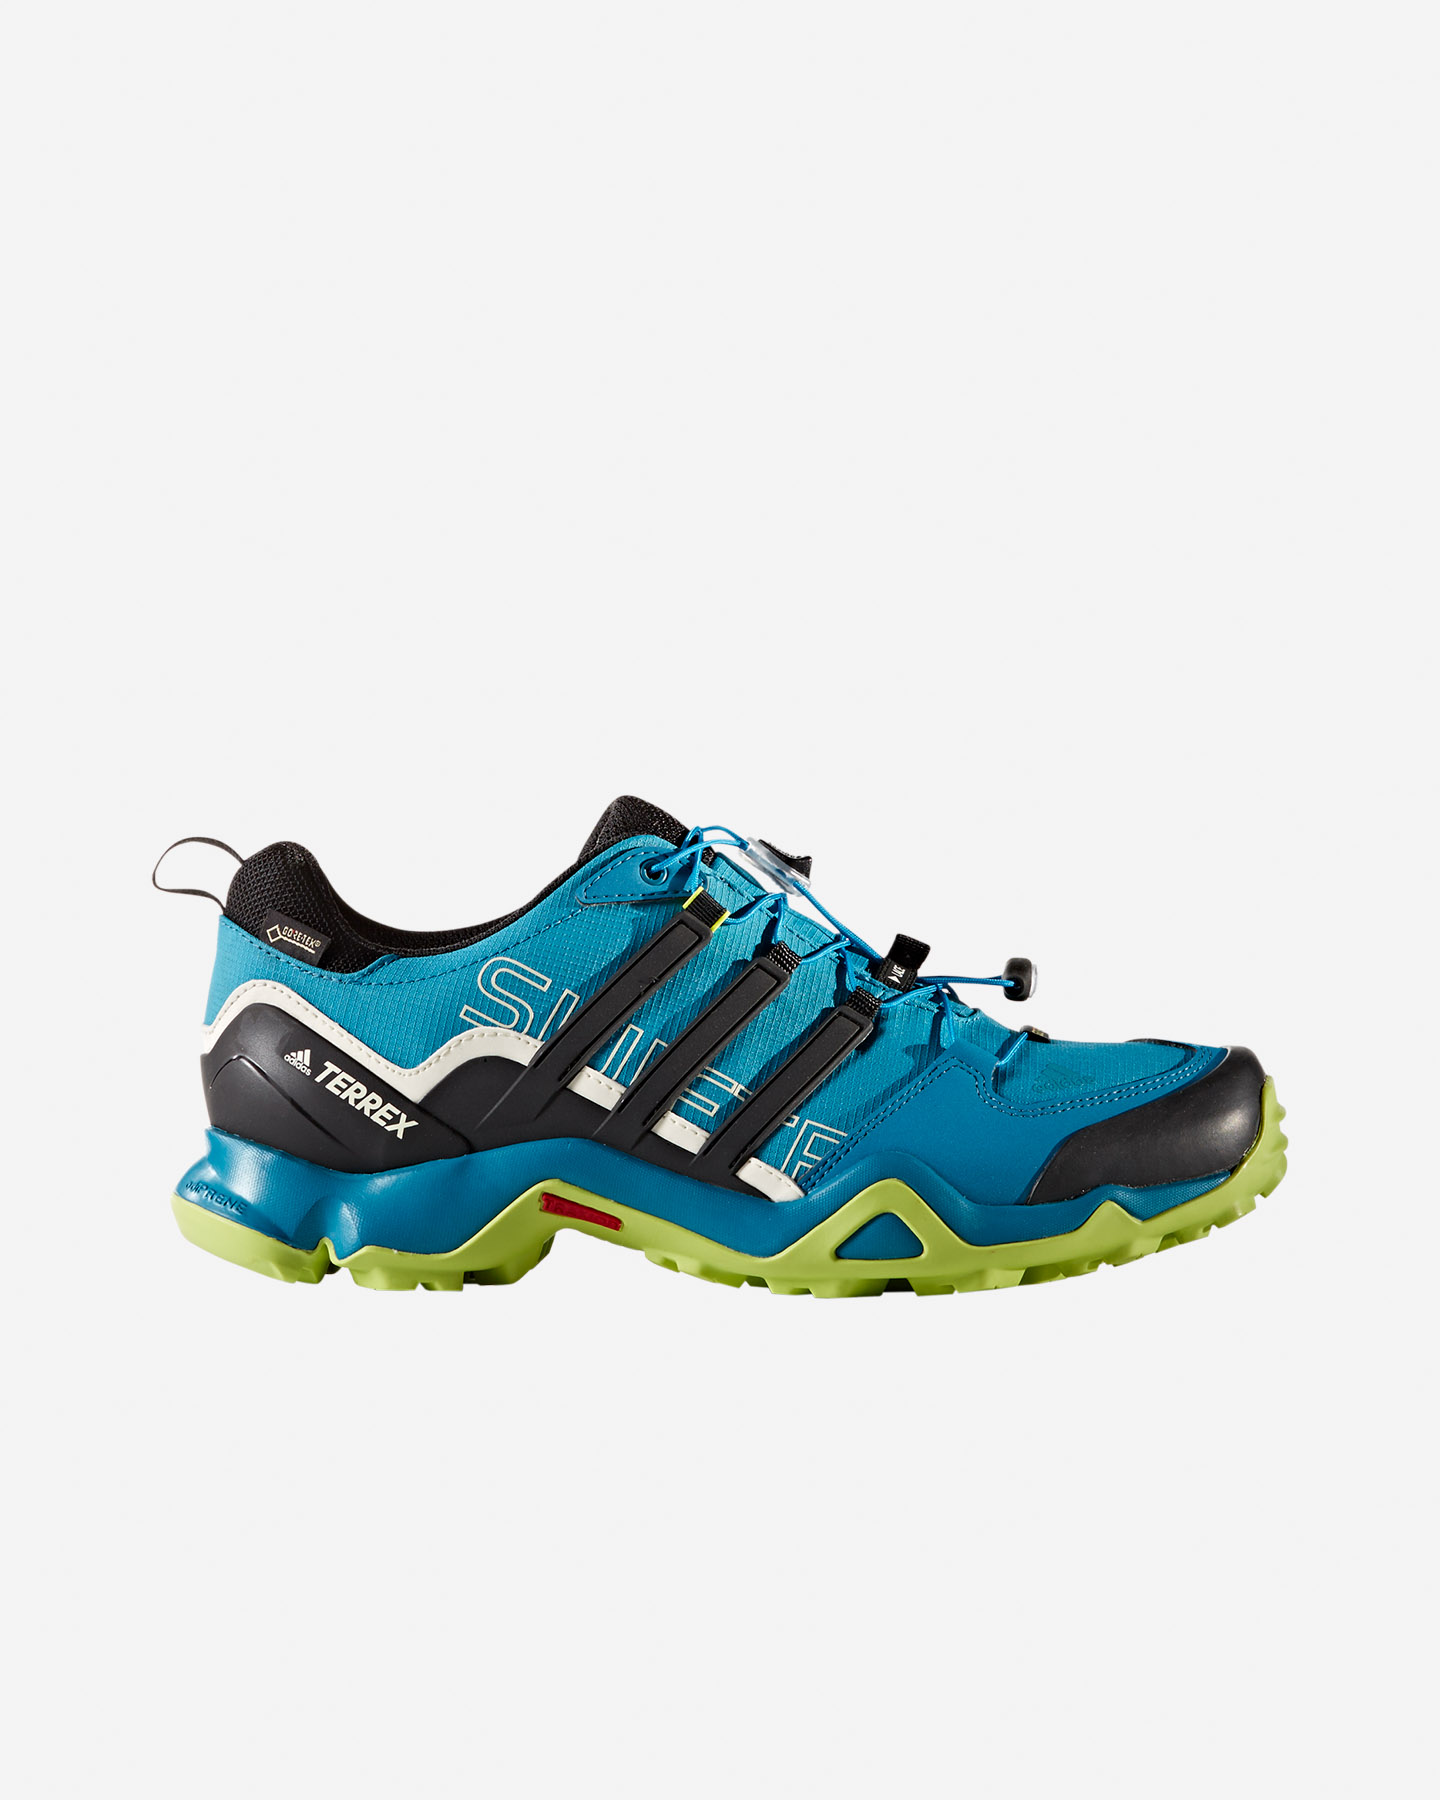 adidas scarpe trial